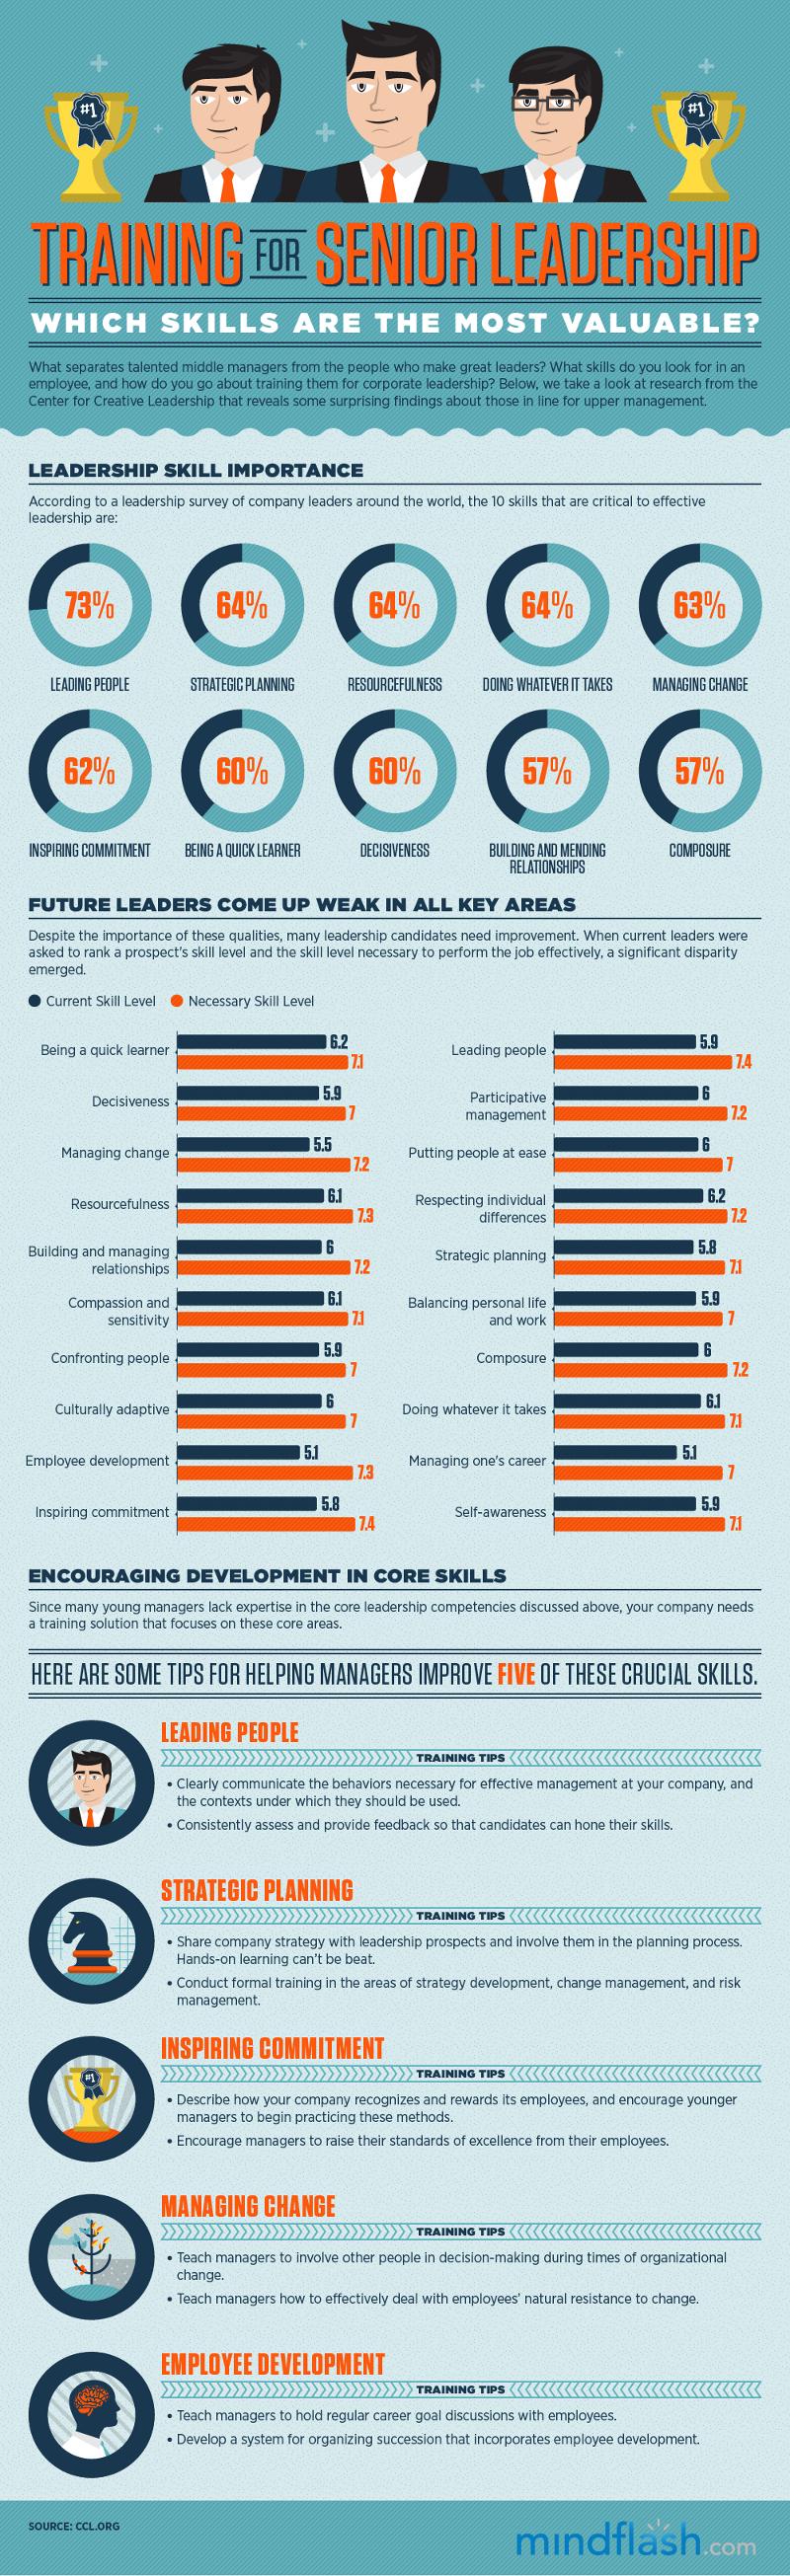 Skills for Senior Leadership